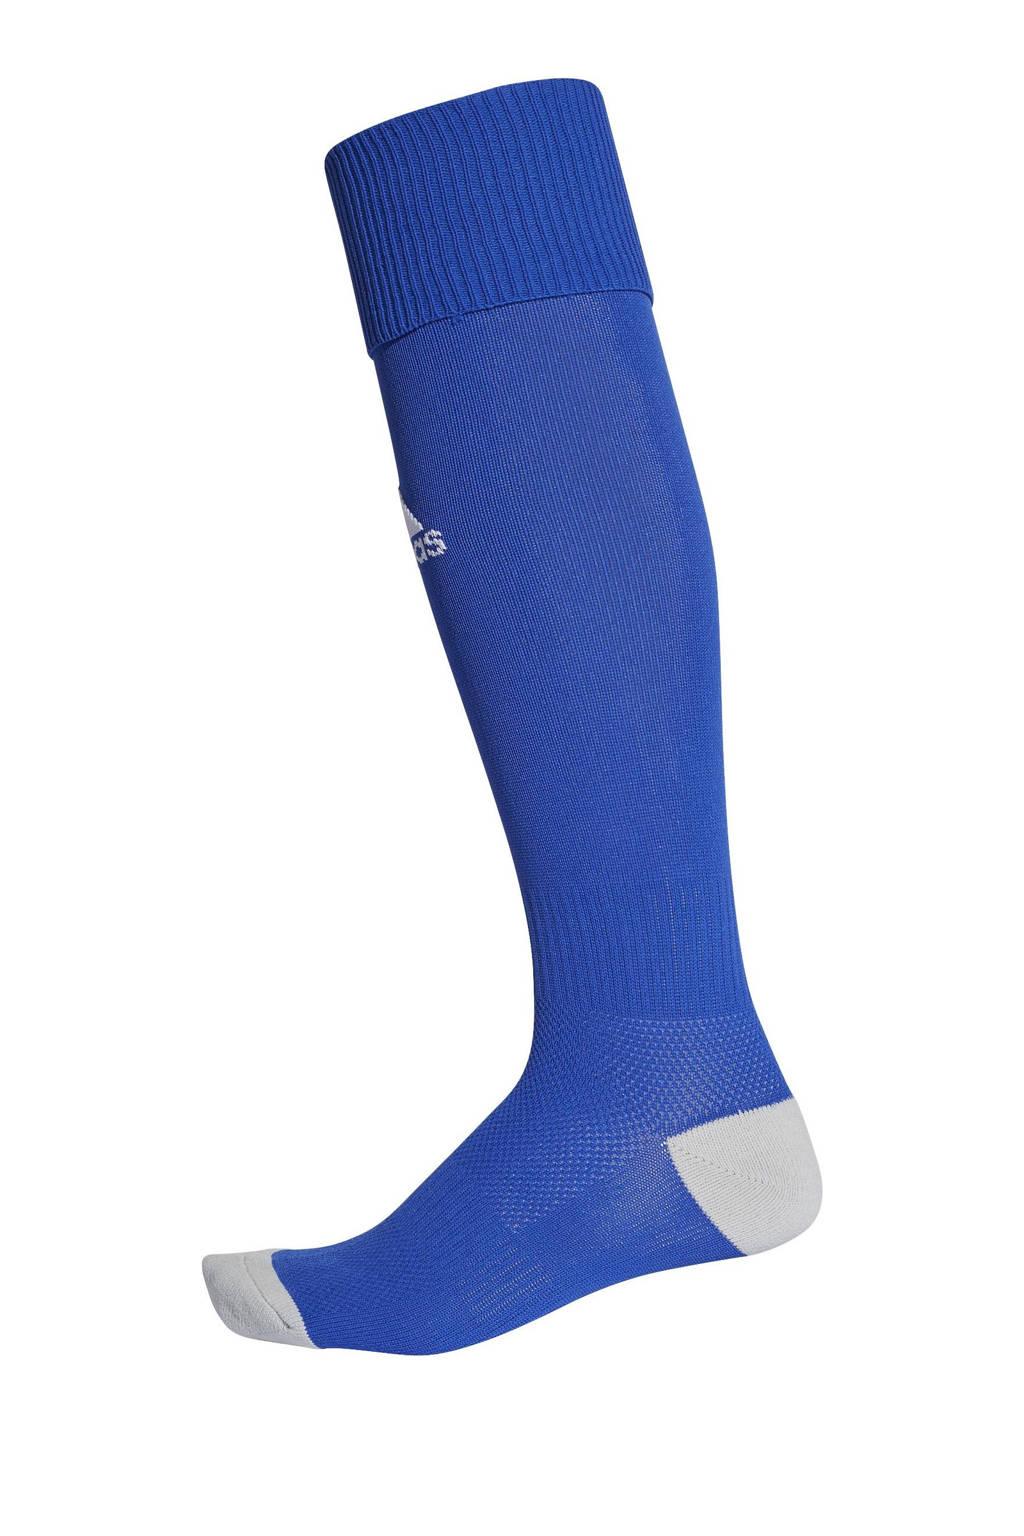 adidas performance Senior  Milano 16 voetbalsokken blauw, Kobaltblauw/wit